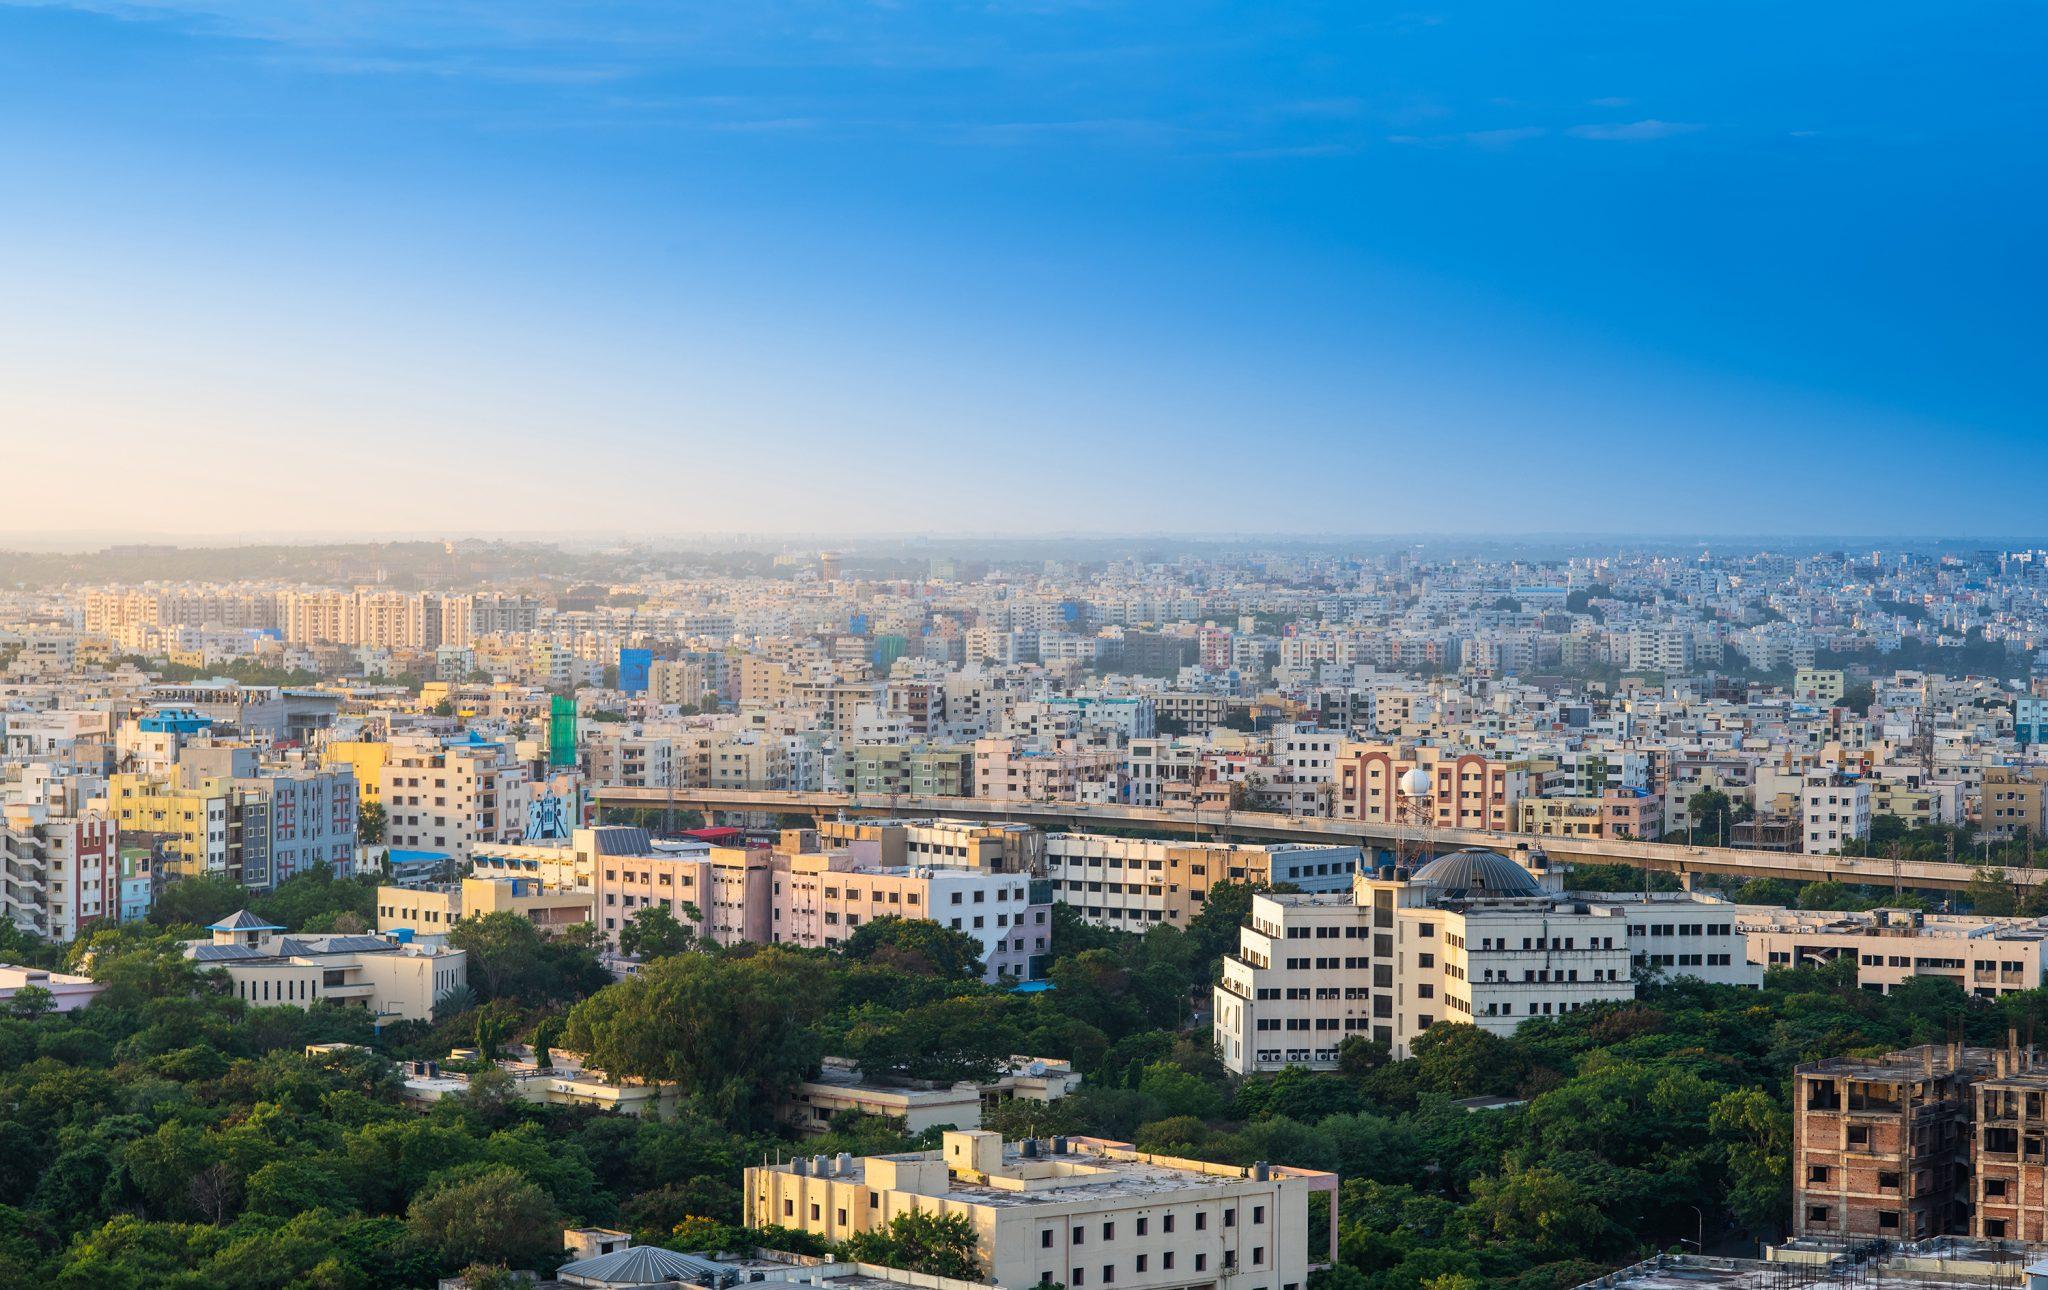 Hyberbad, India